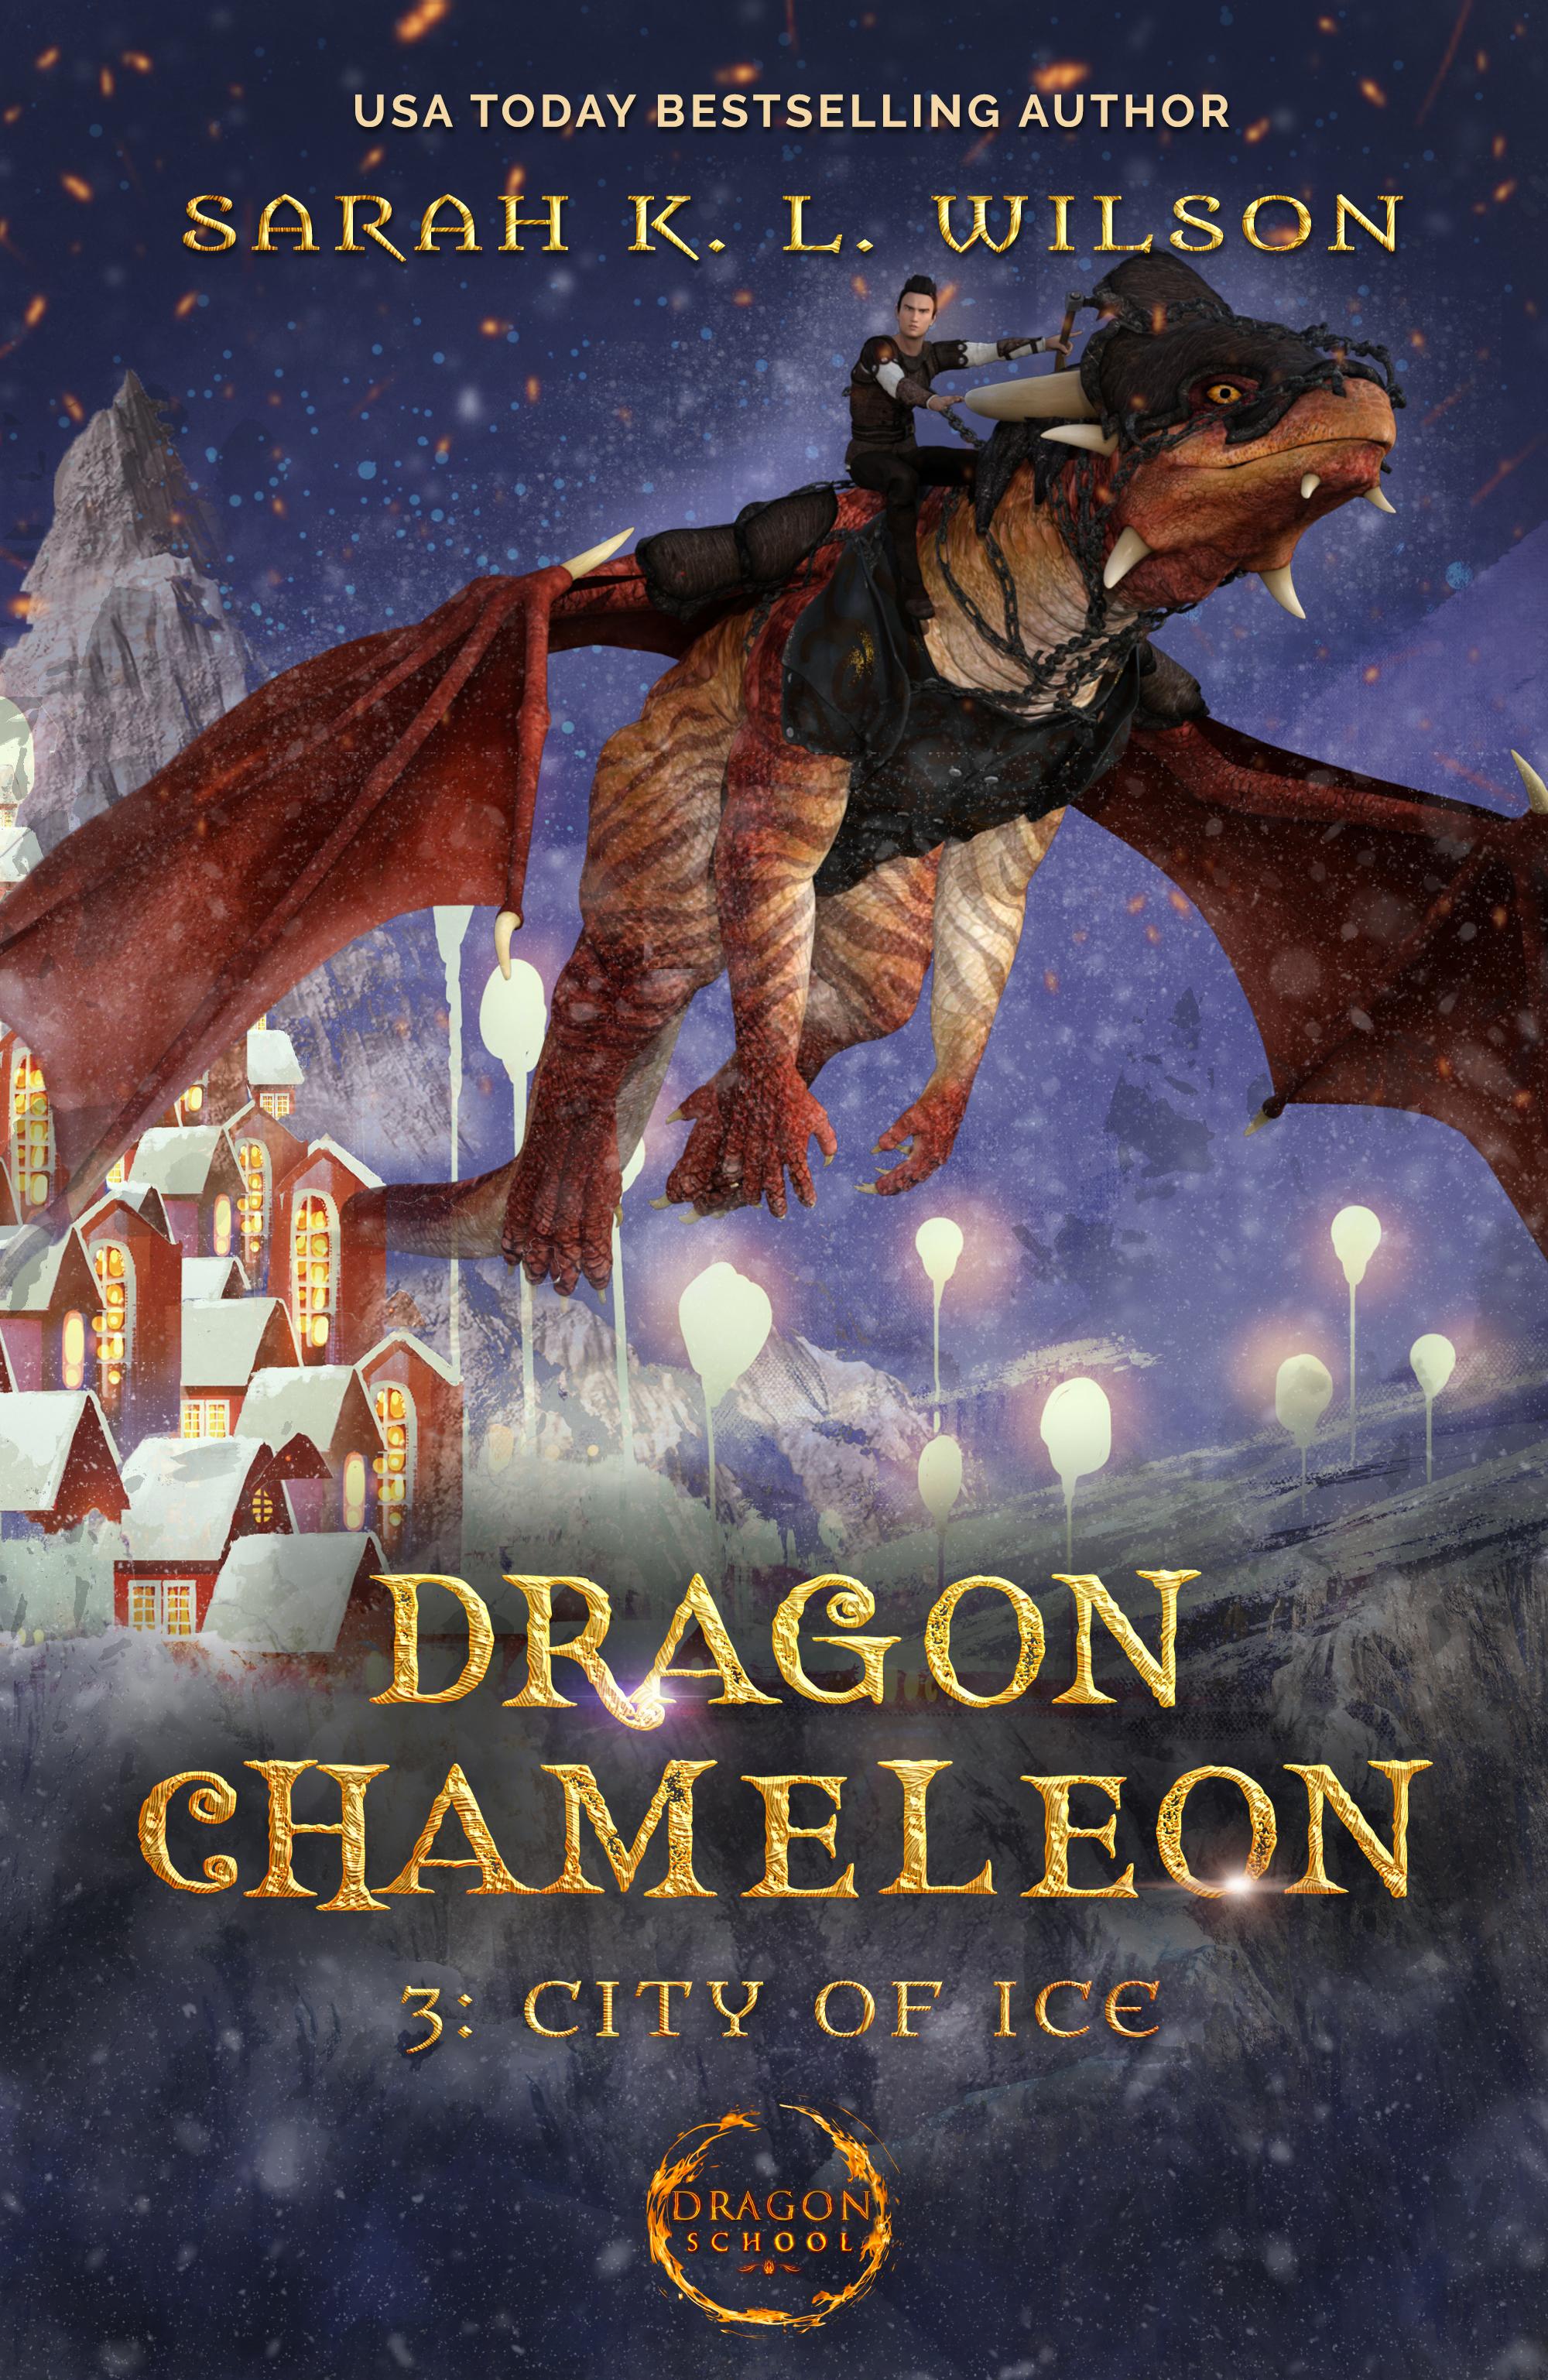 Dragon Chameleon: City of Ice